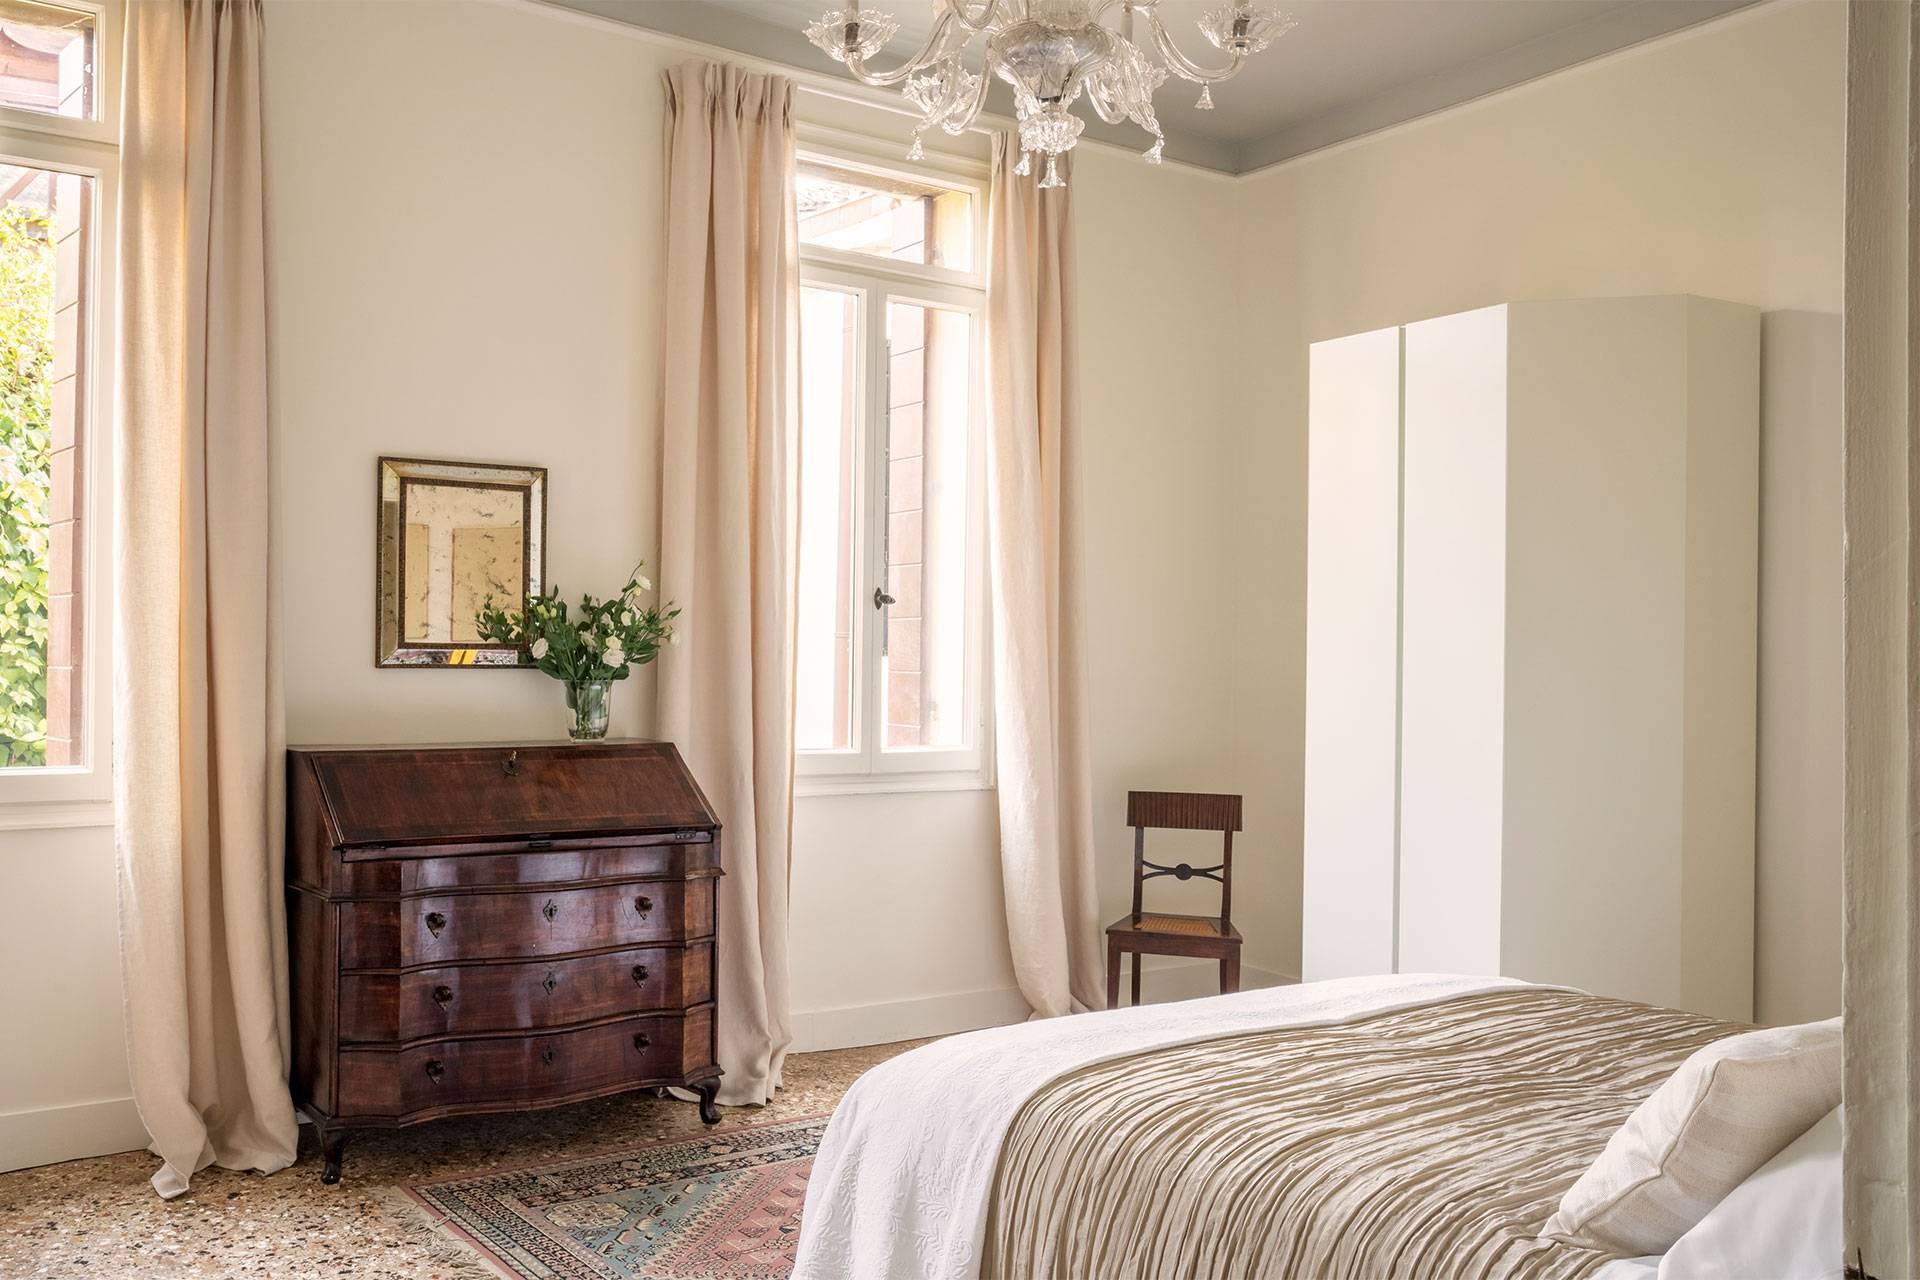 3rd floor: larger bedroom (double or 2 singles)